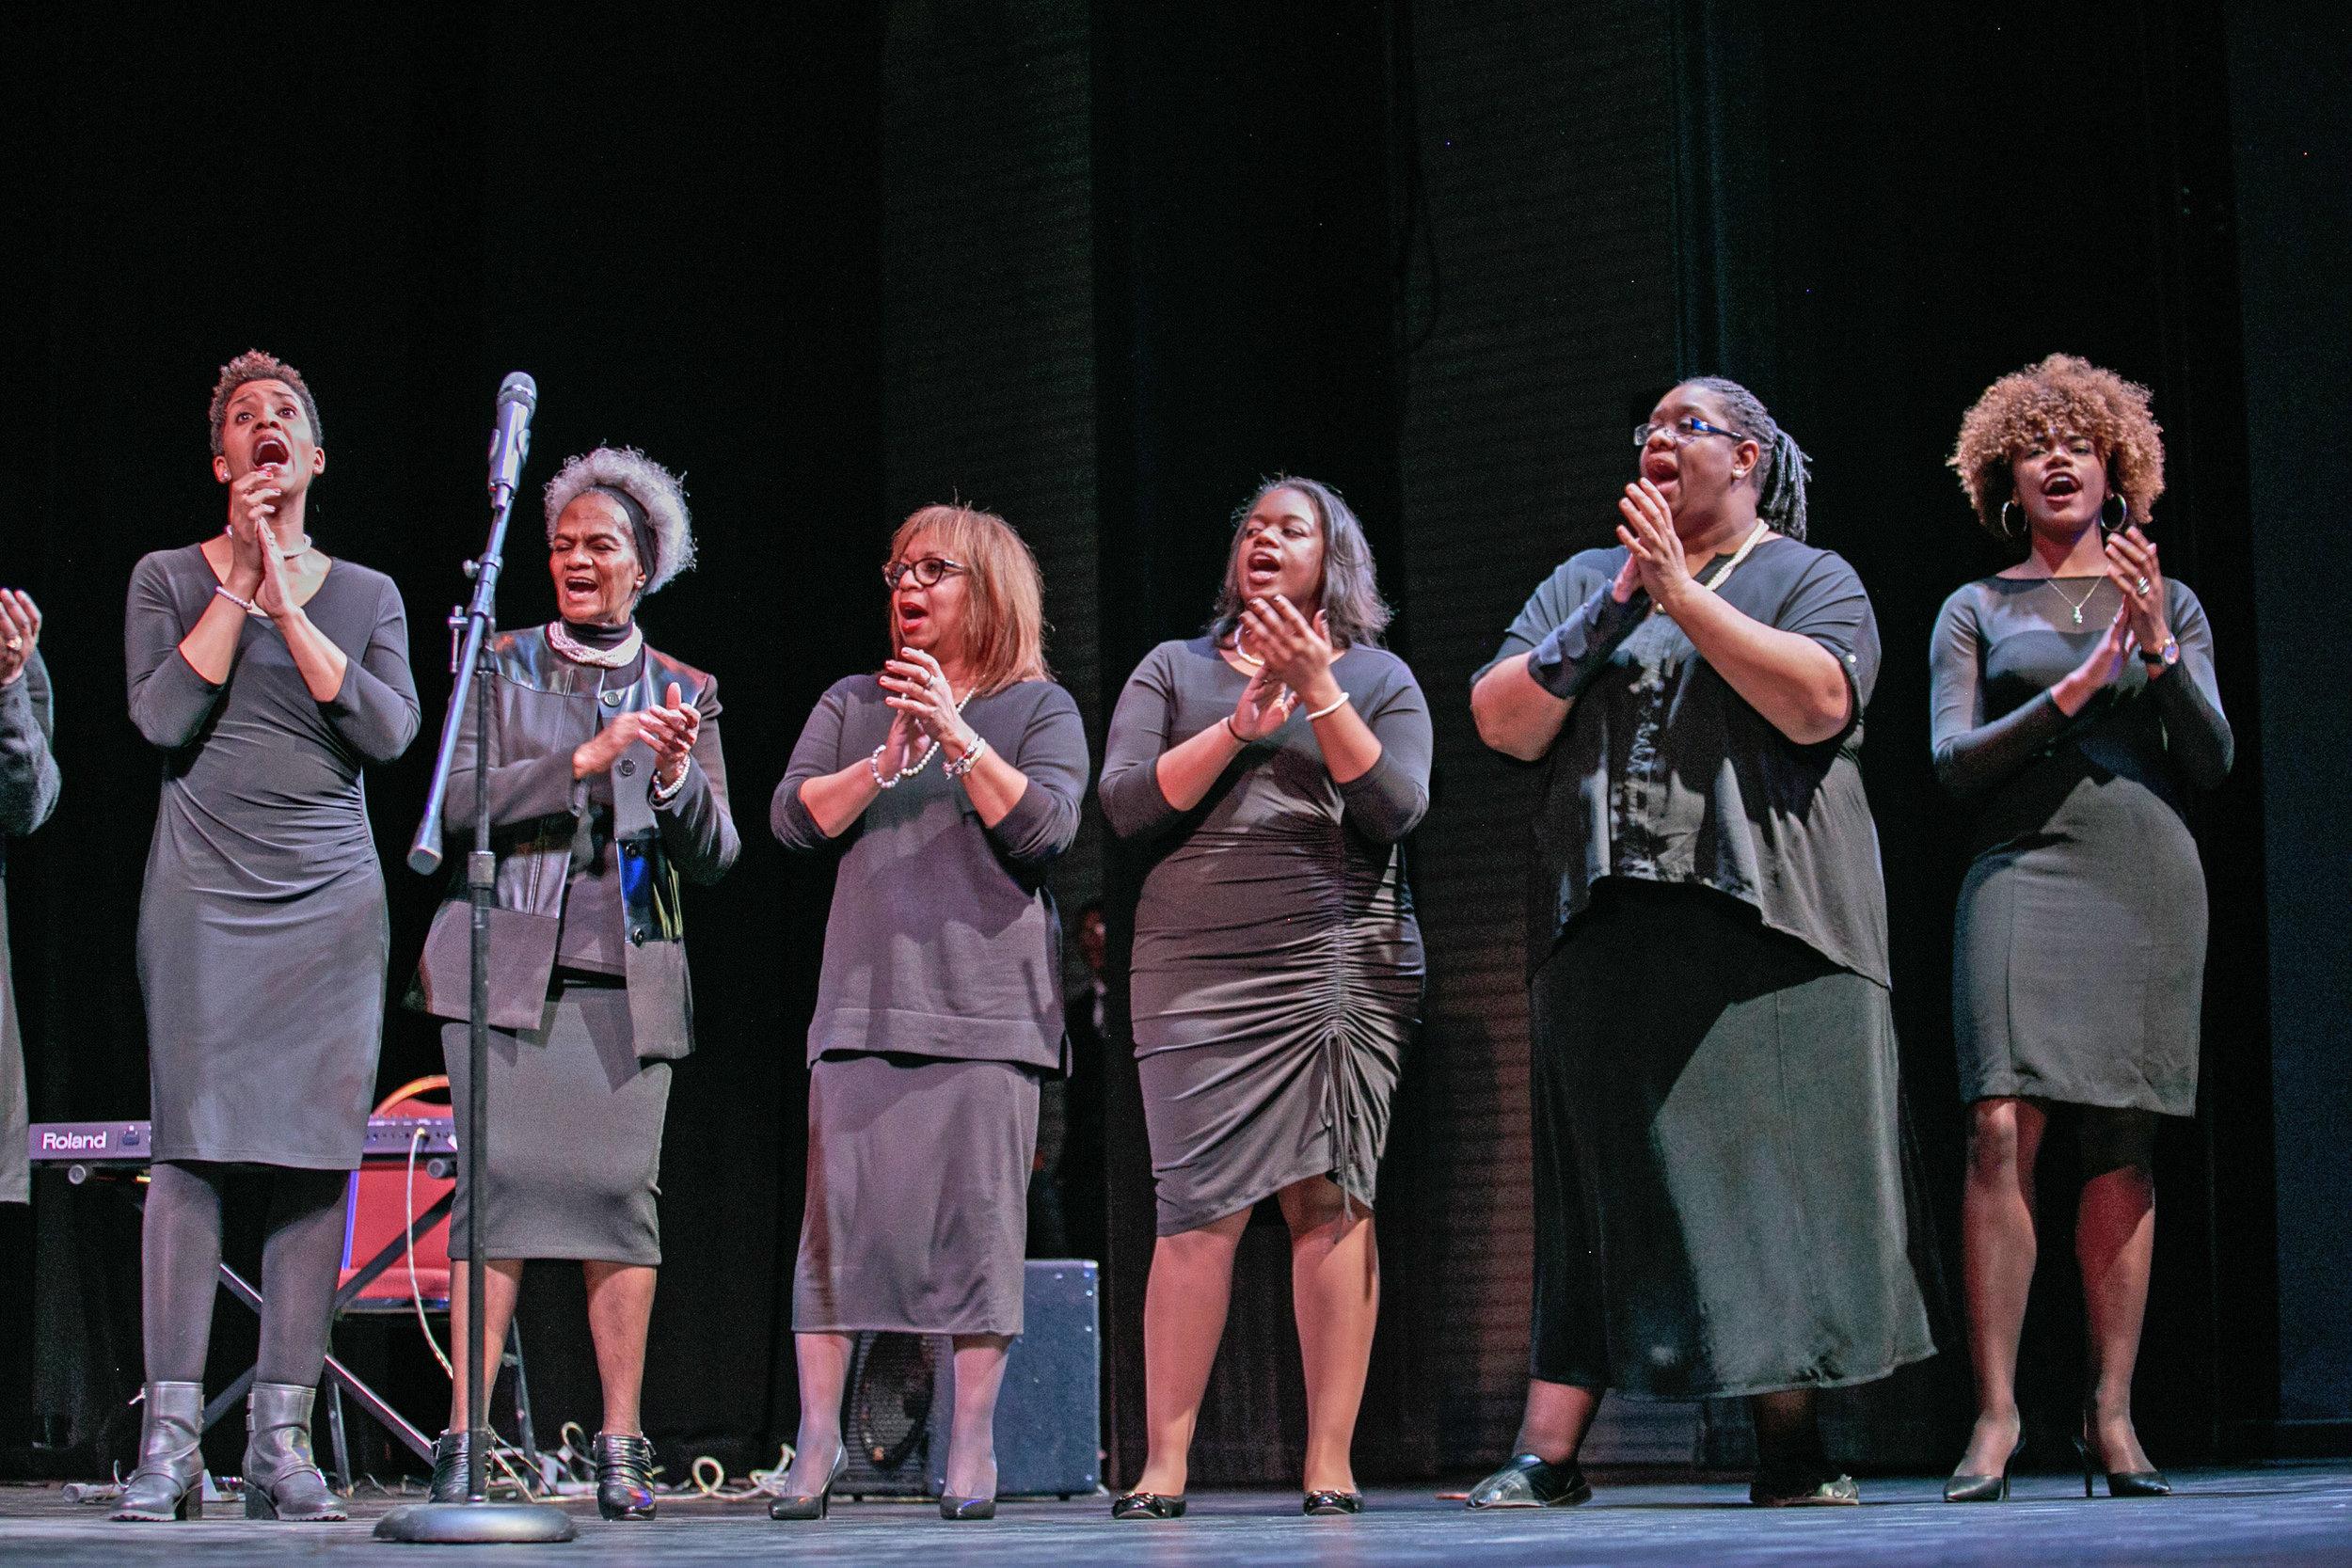 Members of the Macedonia Baptist Church Praise Ensemble. Far right: Simon's Rock junior Arielle King.